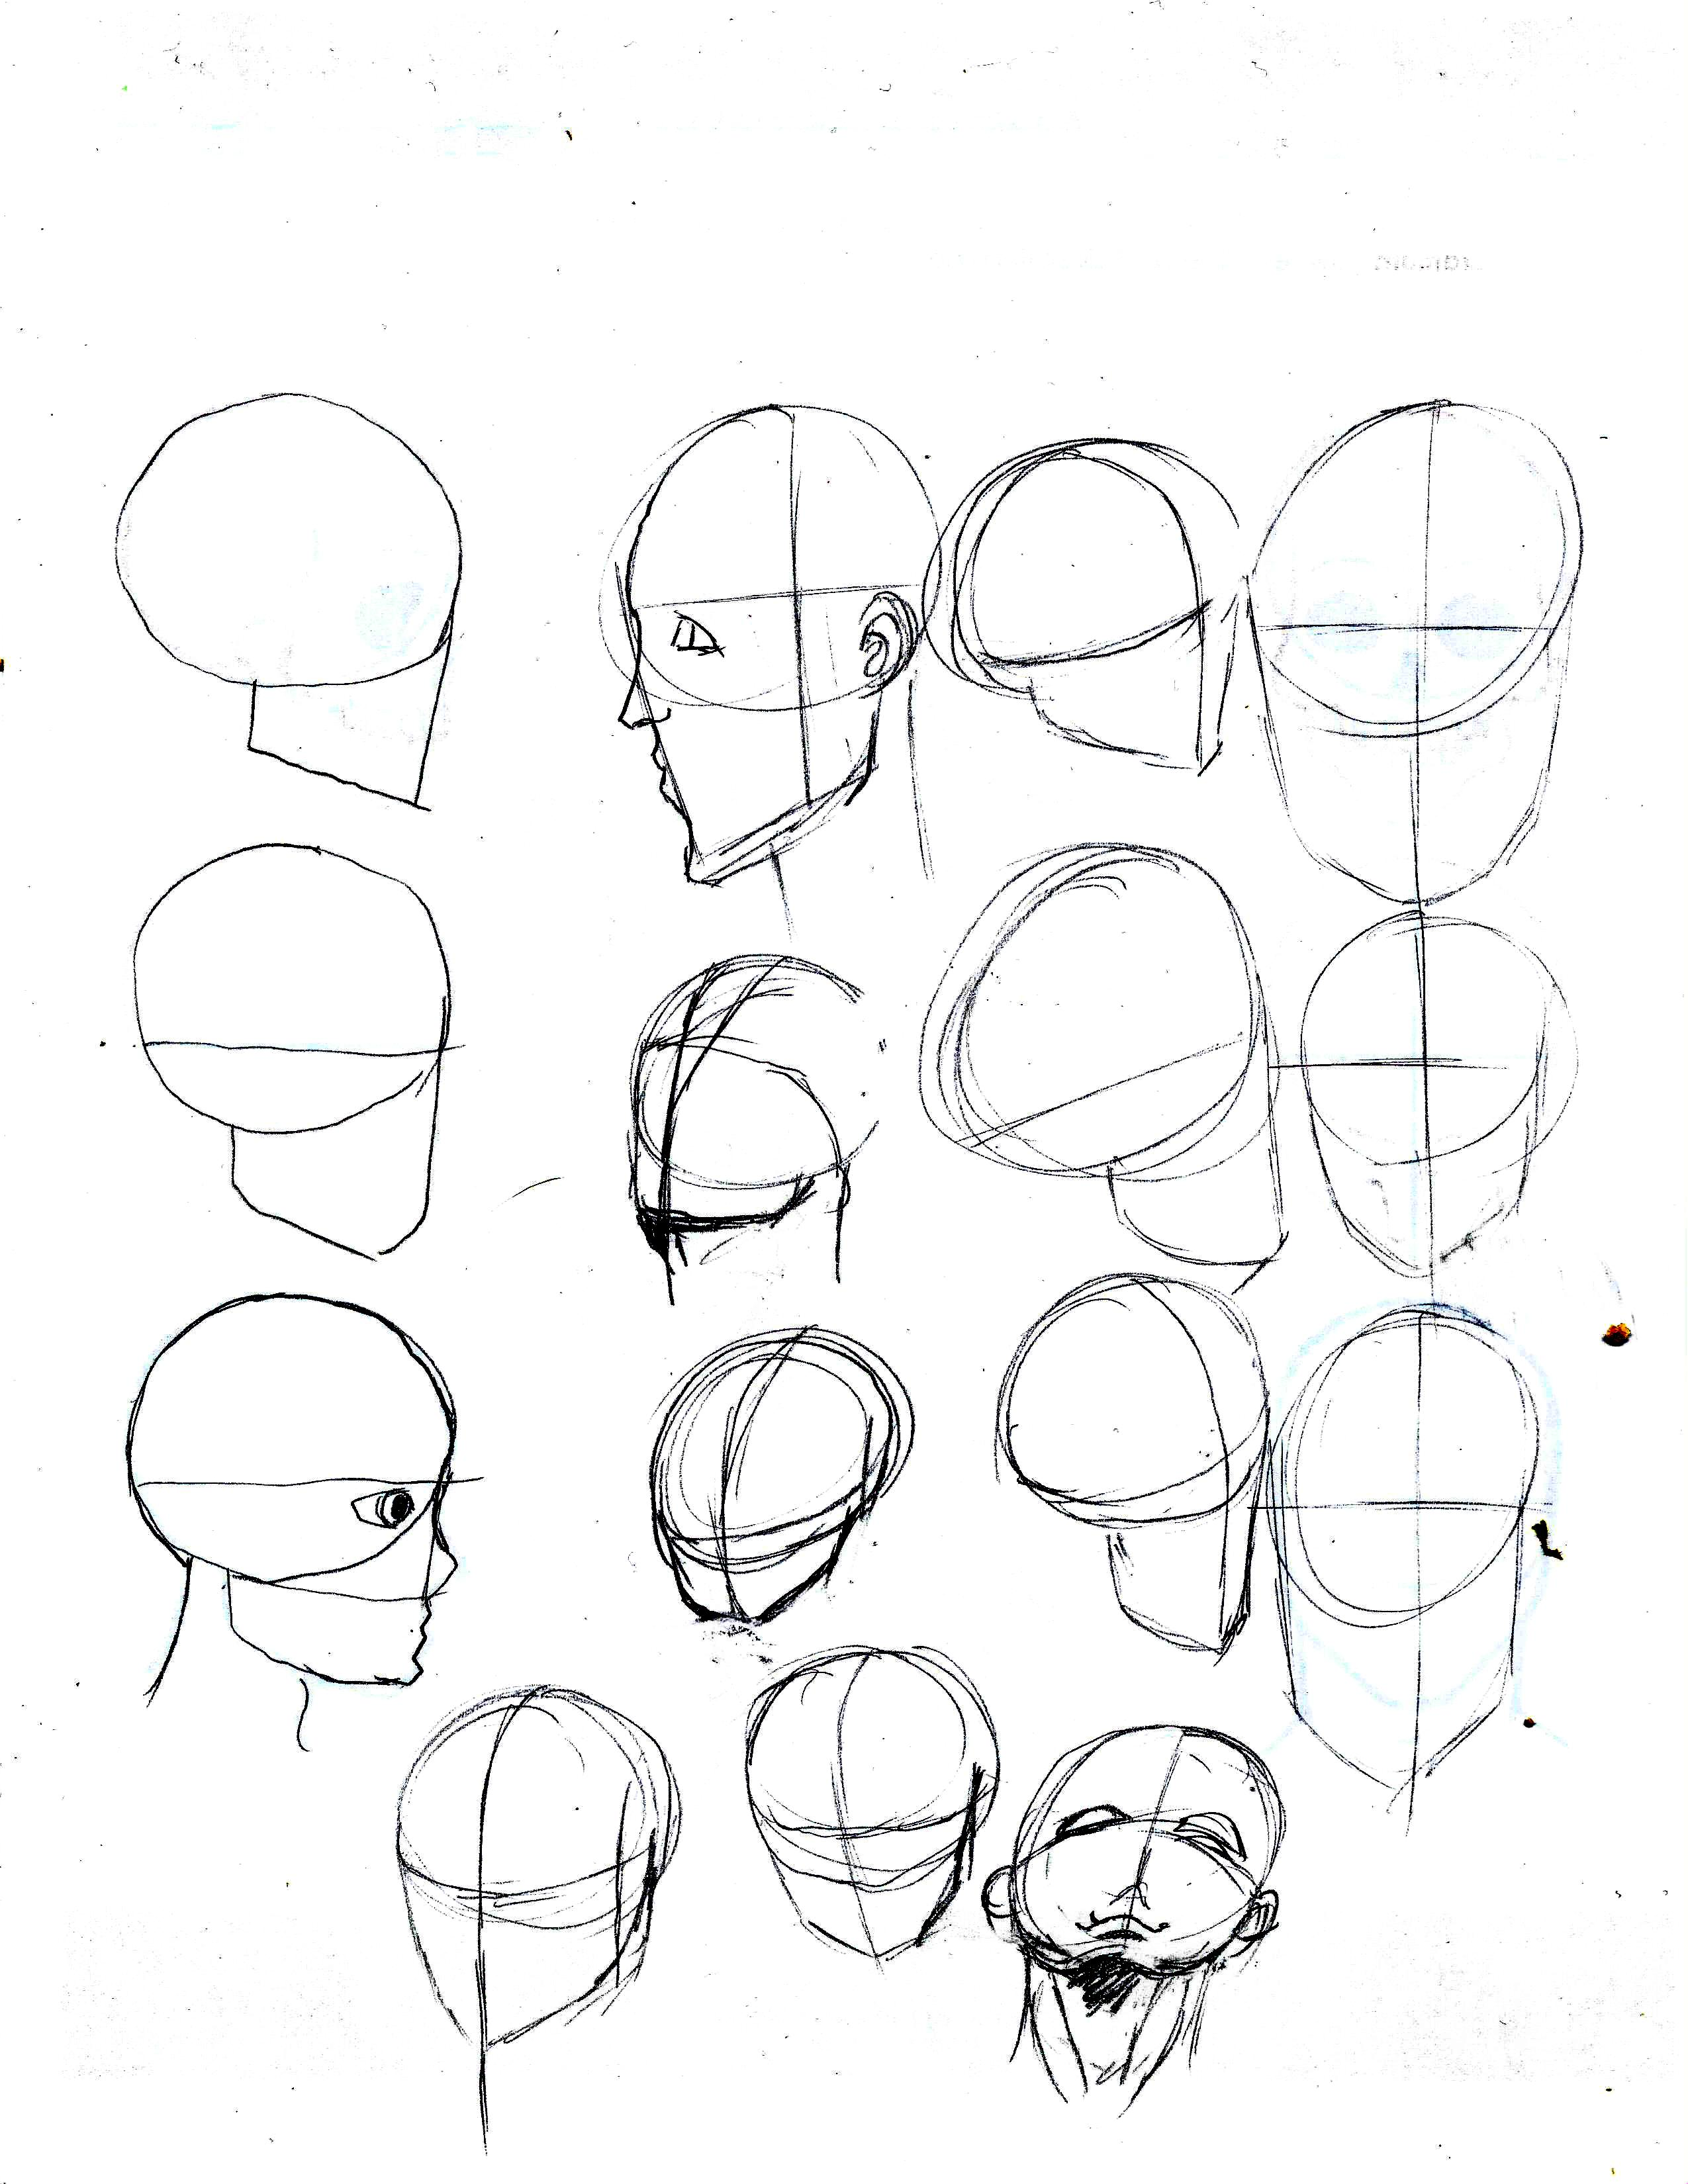 Just Doodling